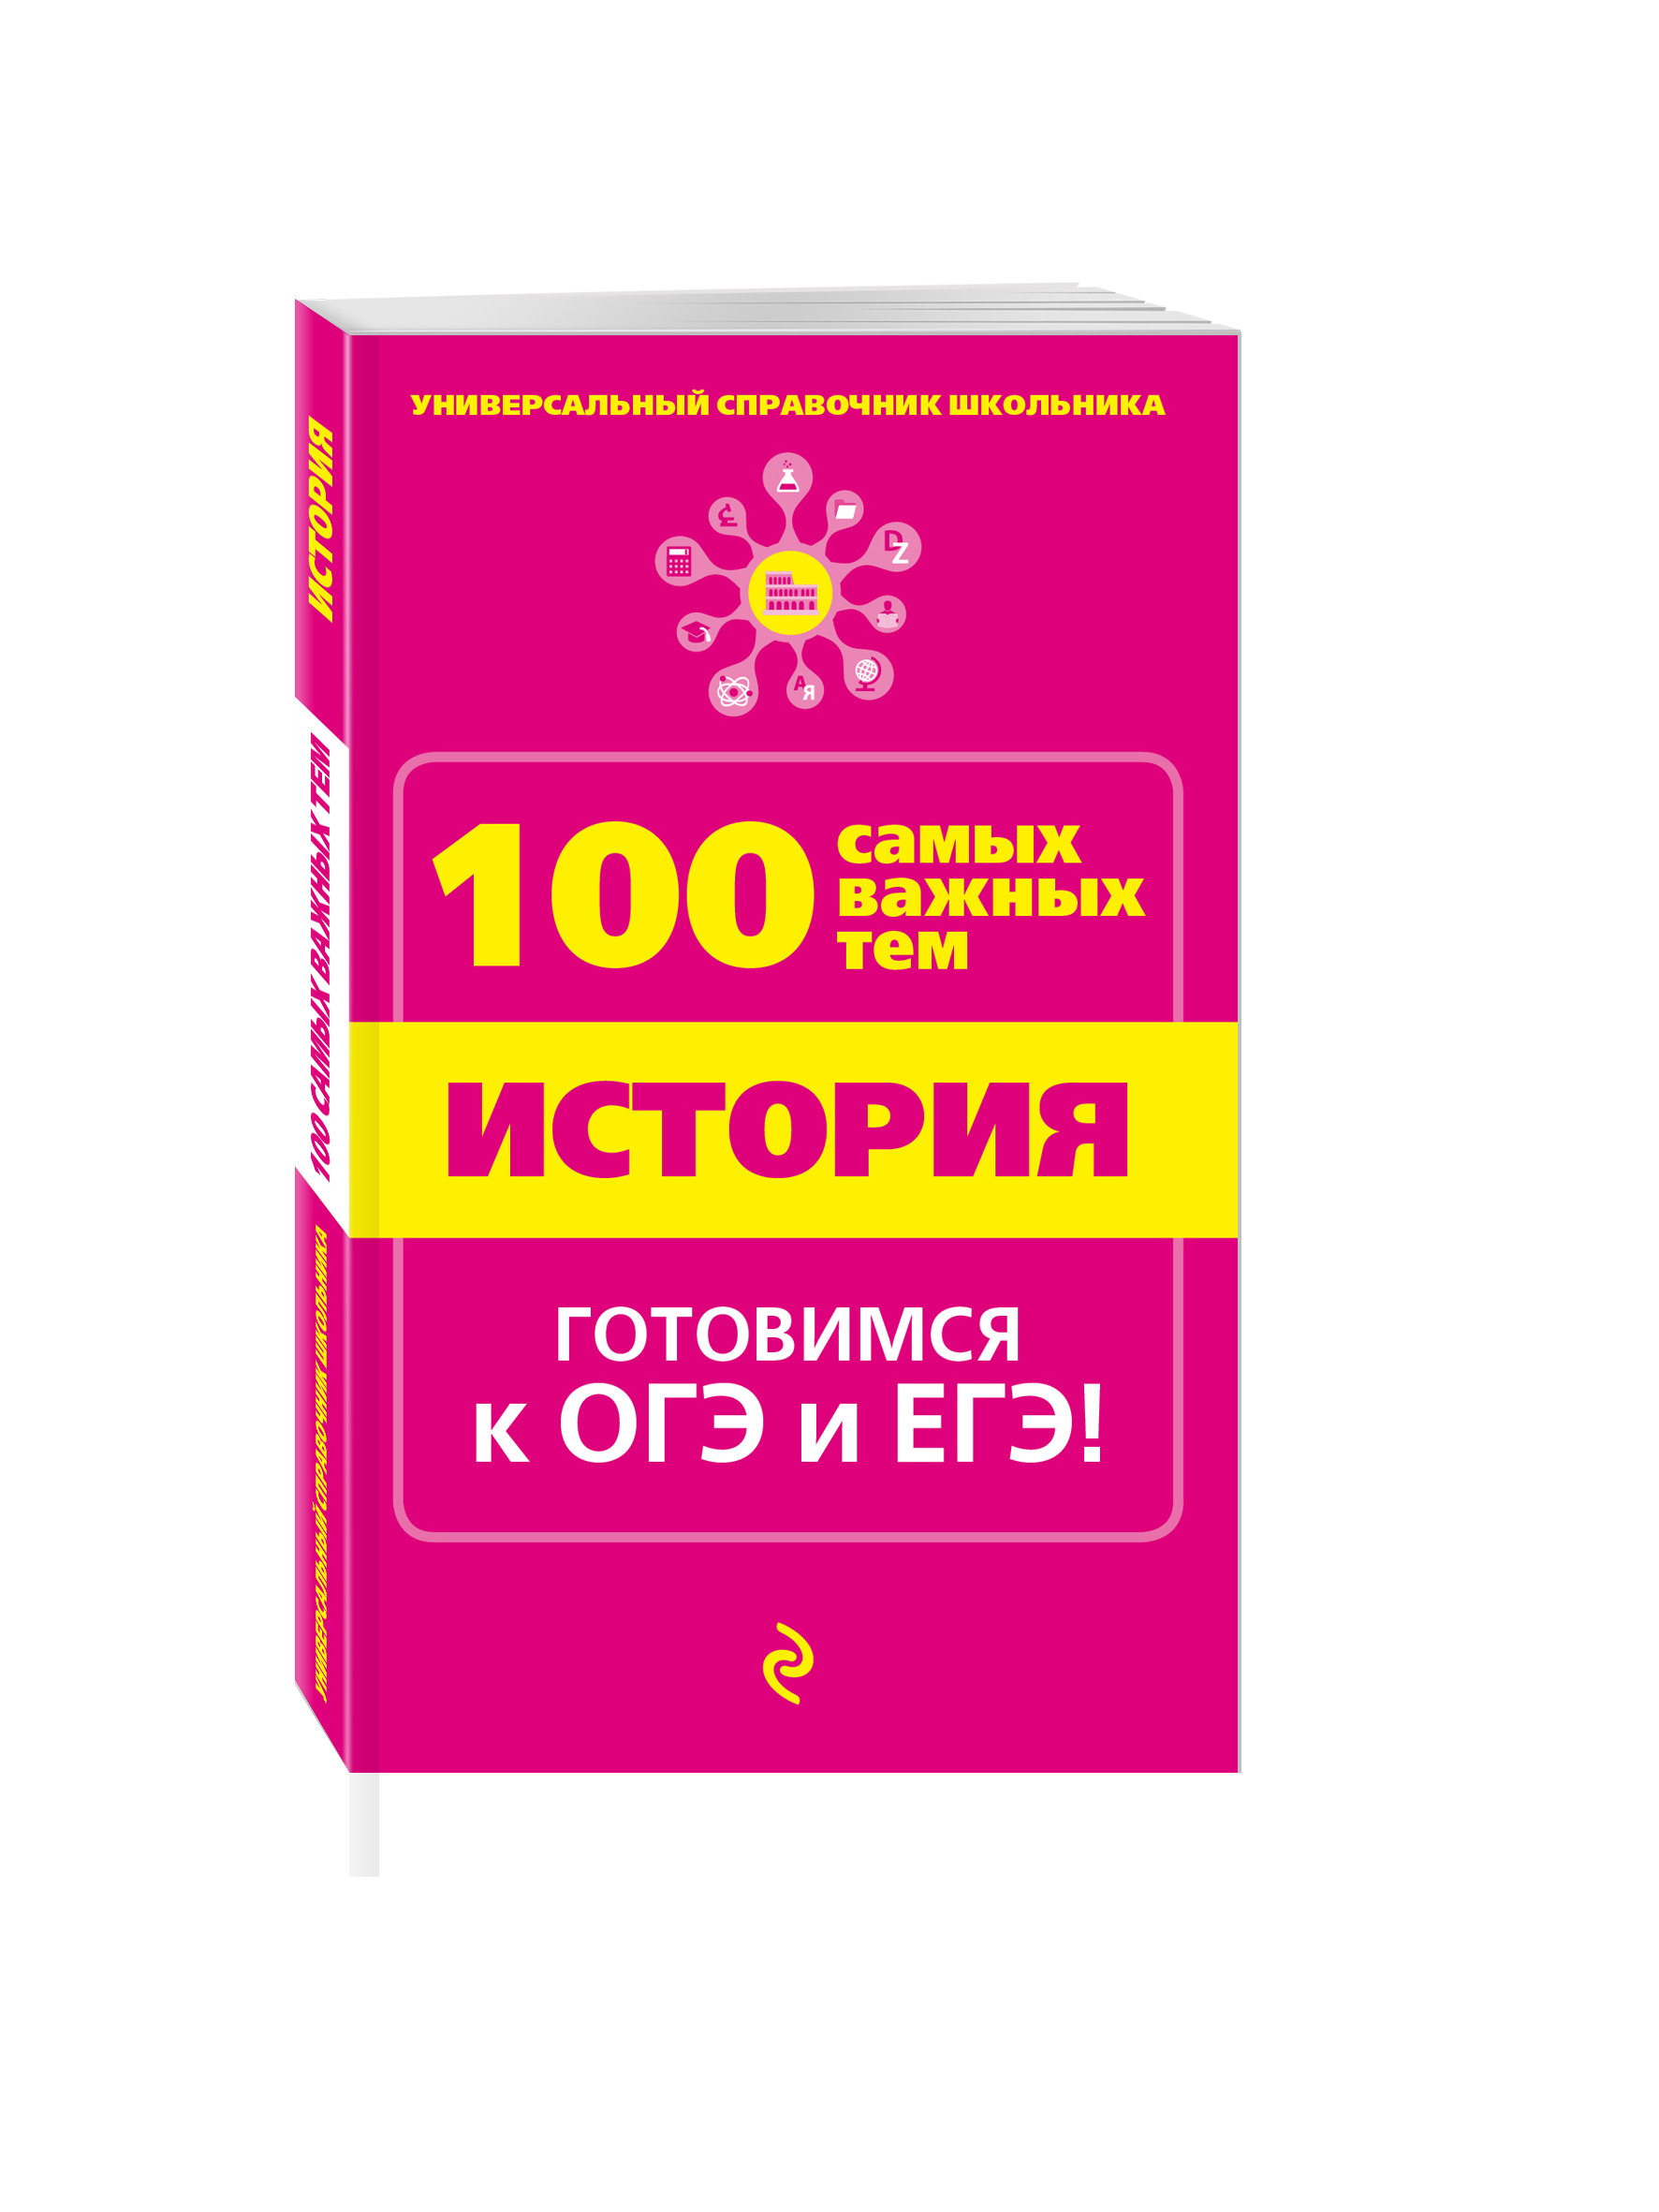 Дедурин Г.Г. История ISBN: 978-5-699-73287-6